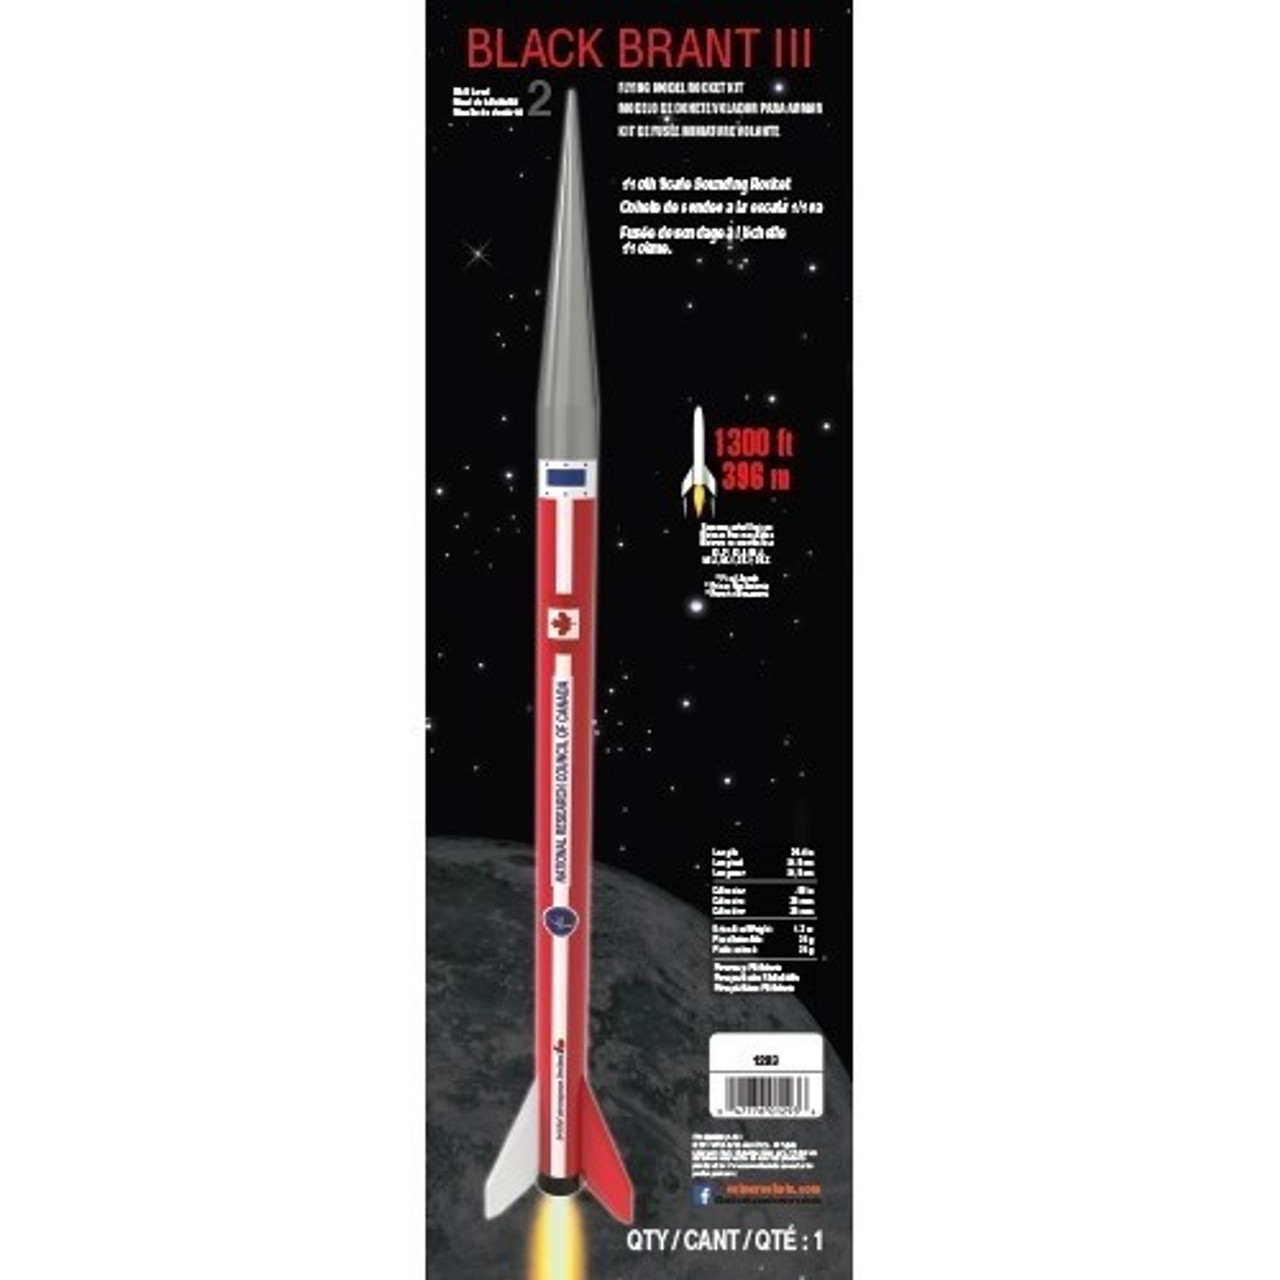 EST-1293  Black Brant III Model Rocket Kit (Skill Level 1)